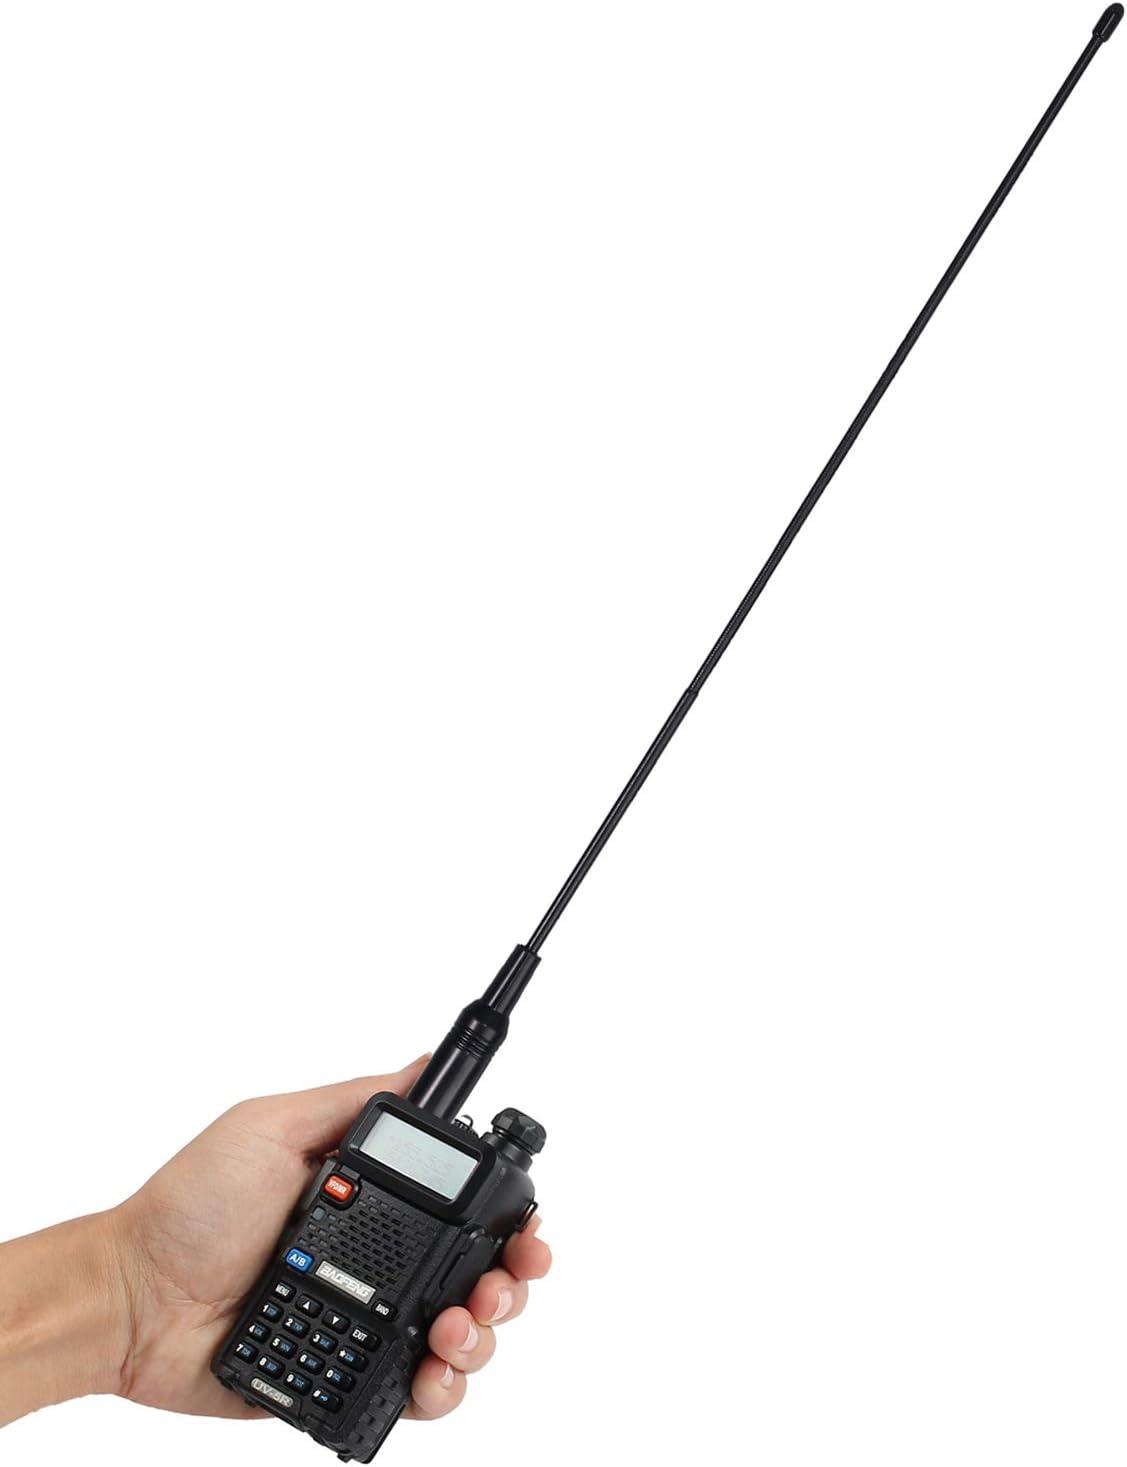 Antena para Walkie Talkie Alta Ganancia Antena Walky Talky SMA-F Antena para Radio Emisora de 40cm